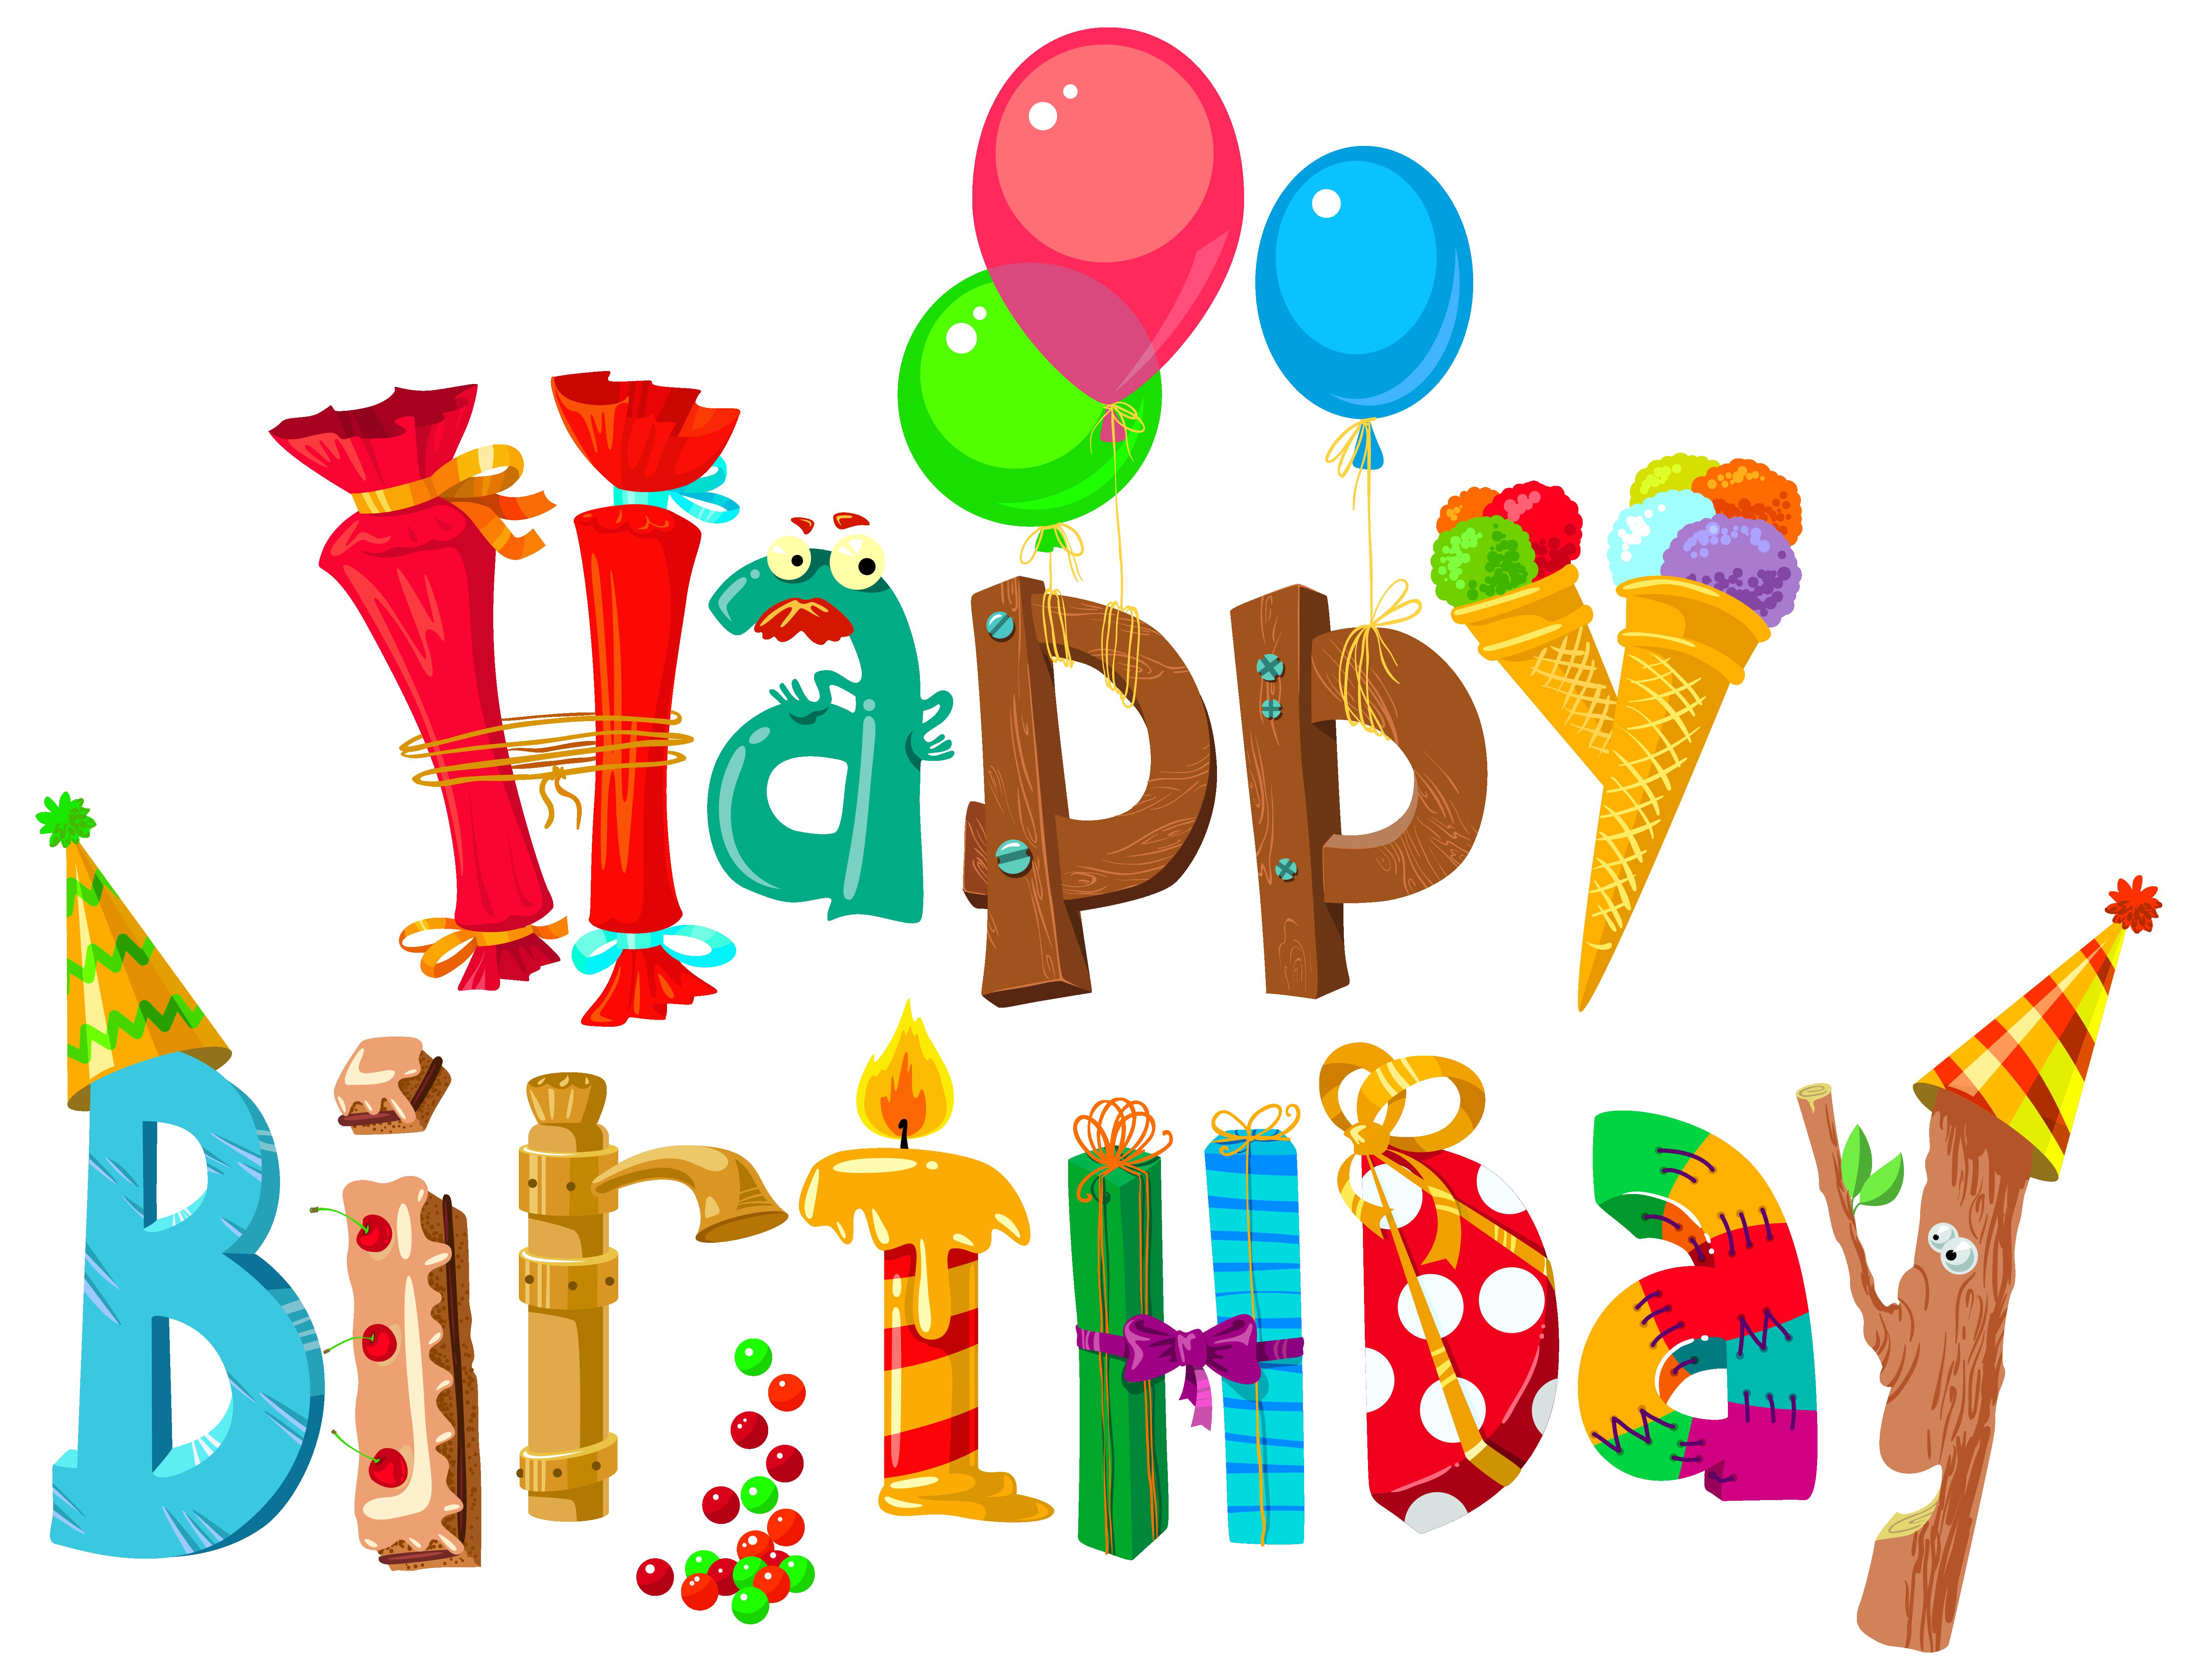 Free Birthday Birthday Clipart .-Free birthday birthday clipart .-6